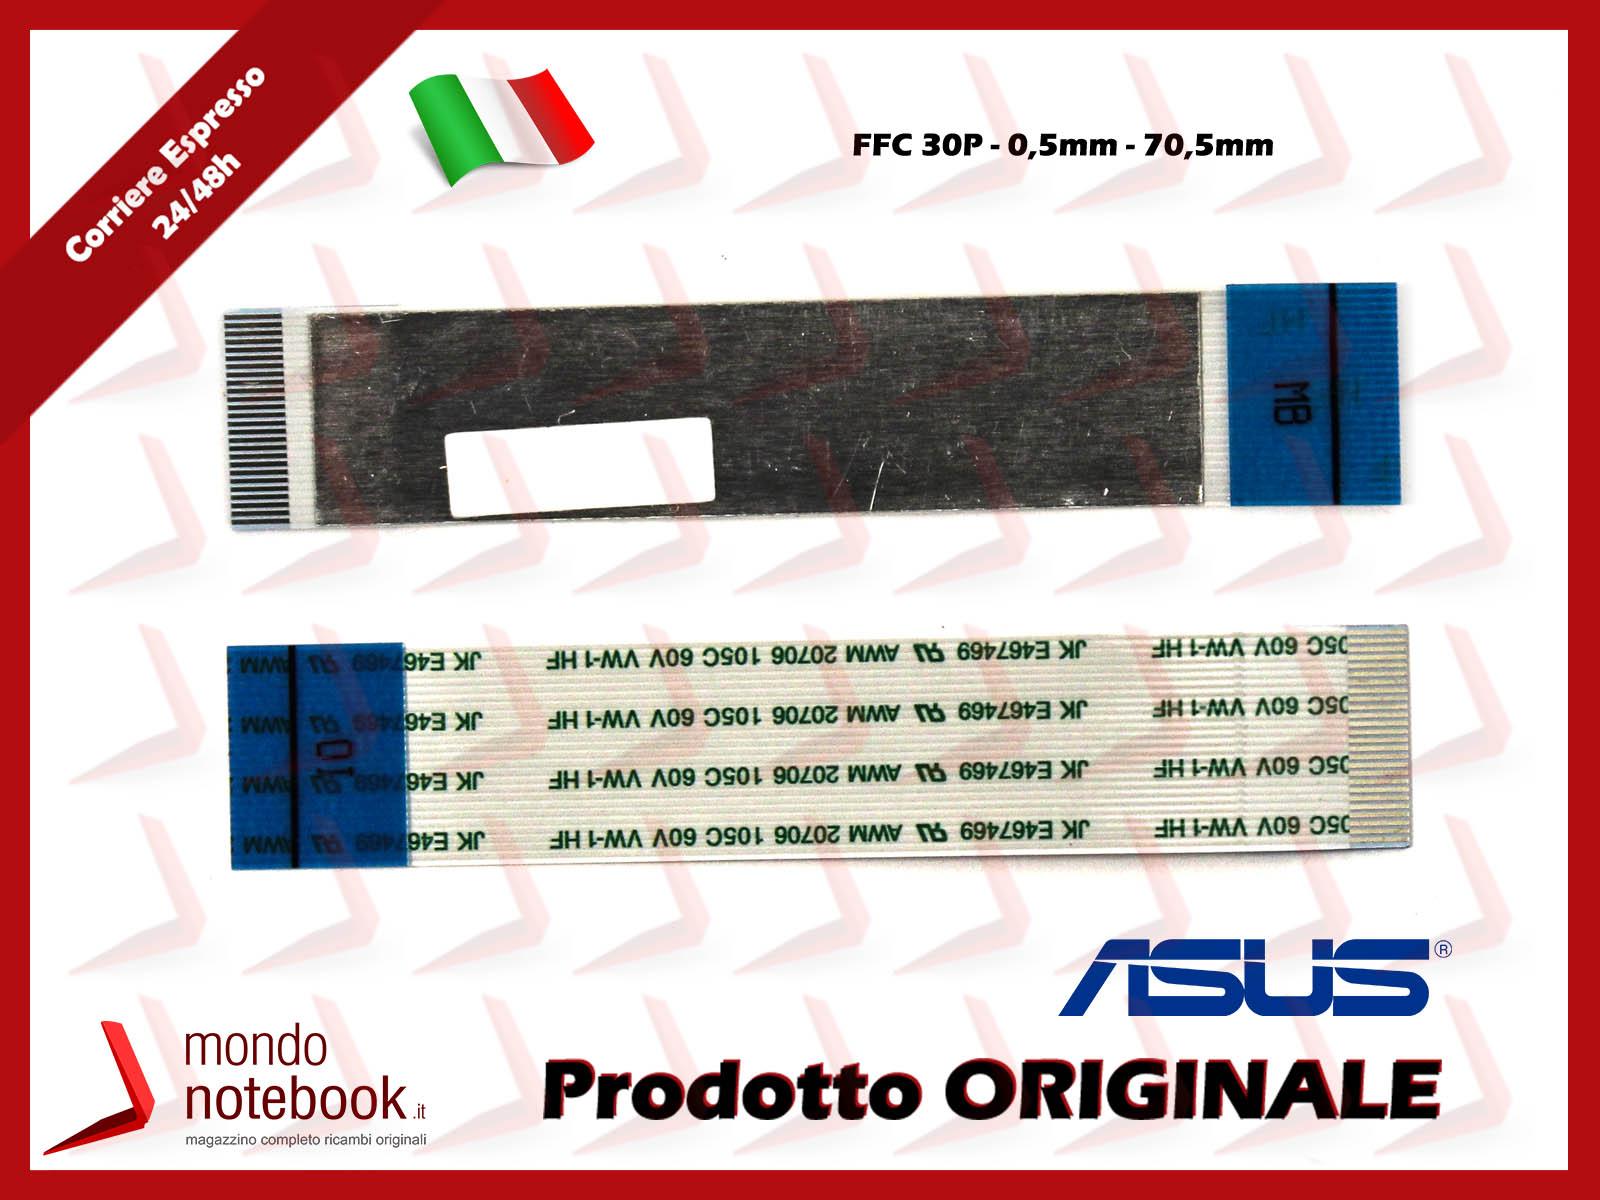 https://www.mondonotebook.it/5676/batteria-rigenerata-originale-hp-dv1000-dv4000-dv5000-6-celle.jpg